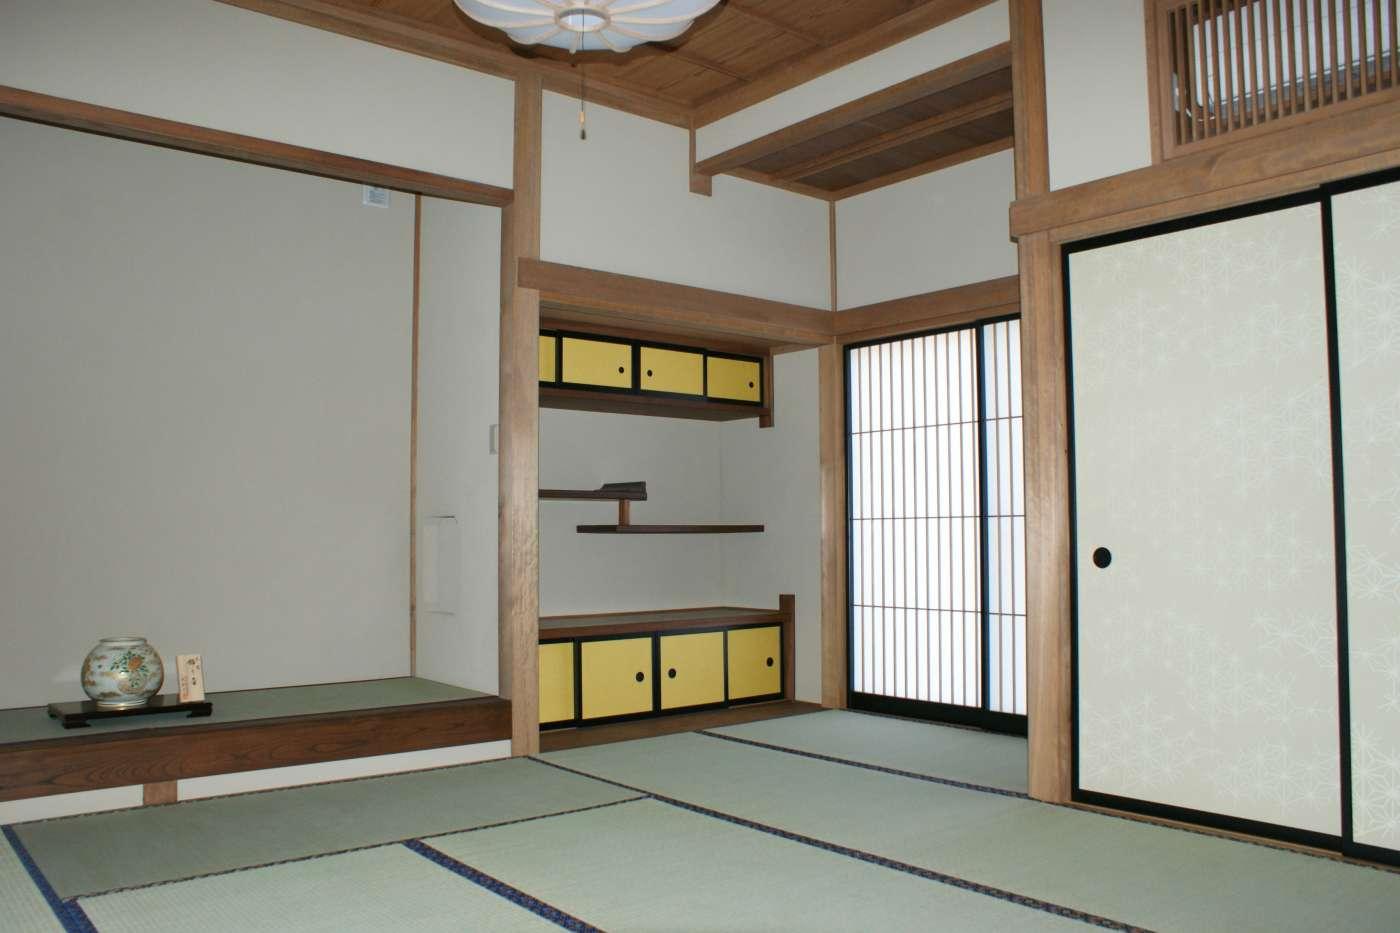 http://sumainomatsuki.com/folder1/DSC01690.JPG